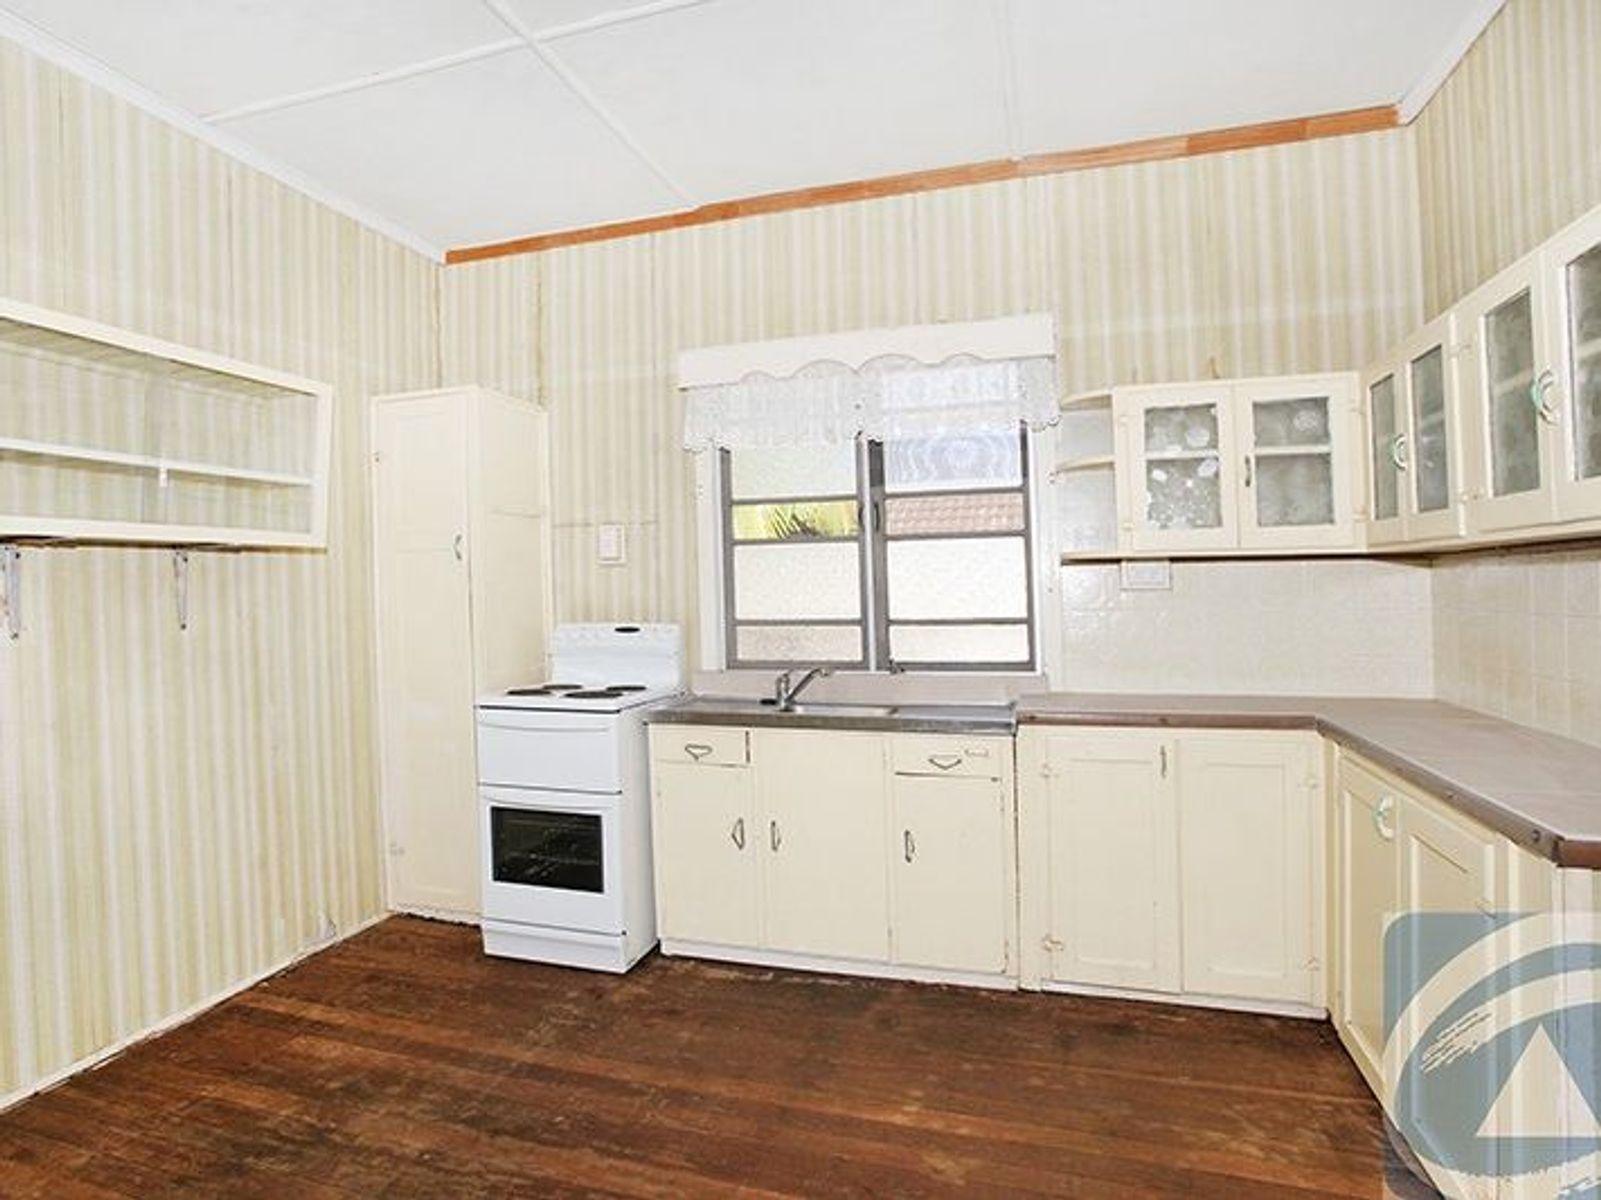 16 Hill Street, Nambour, QLD 4560